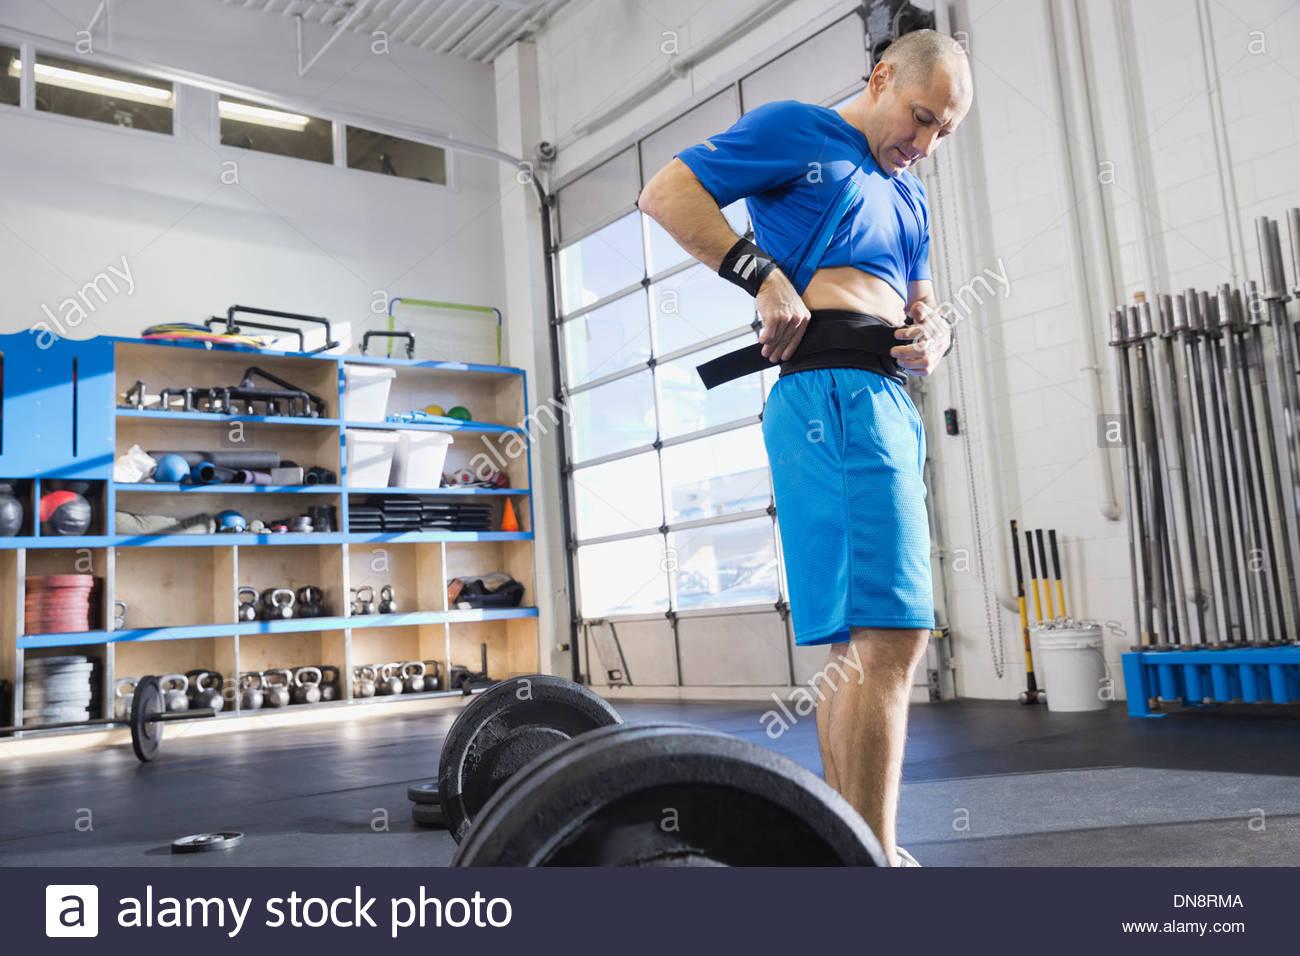 Man adjusting weight lifting belt - Stock Image